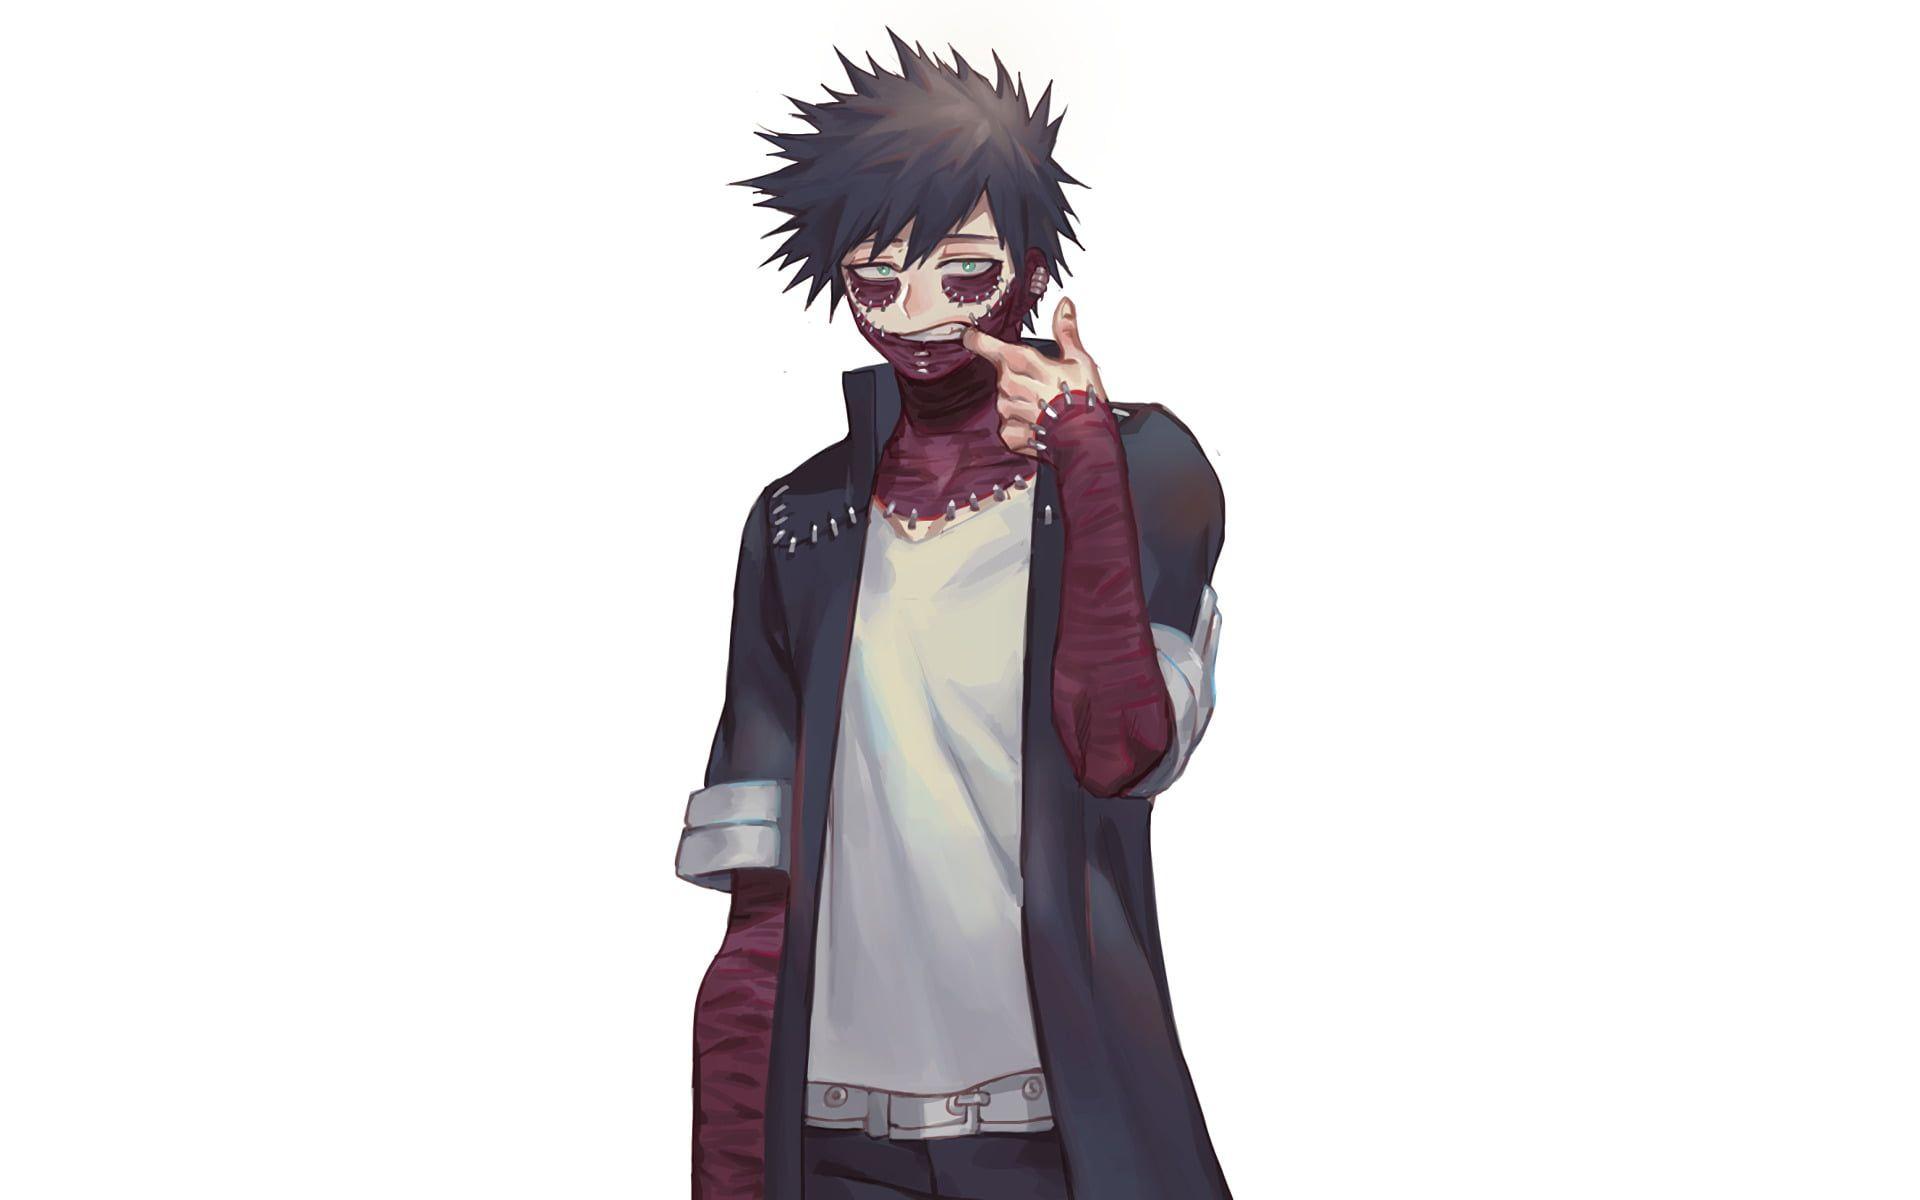 Anime My Hero Academia Dabi Boku No Hero Academia 1080p Wallpaper Hdwallpaper Desktop Hero My Hero Academia My Hero